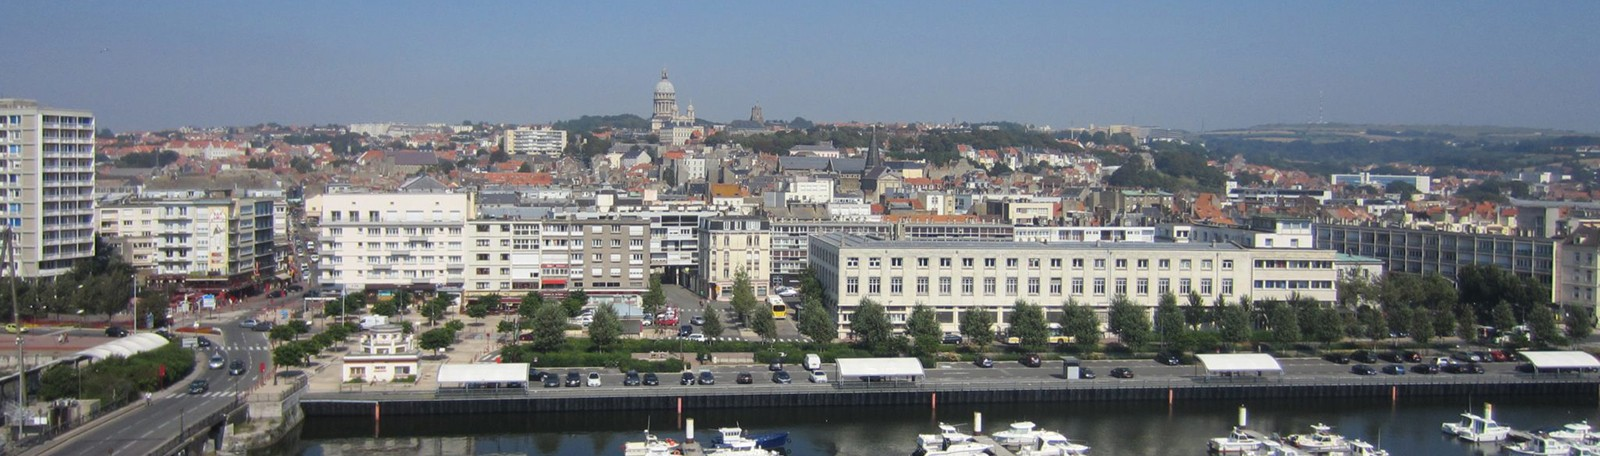 Stationner à Boulogne-sur-Mer Adolphe Herry